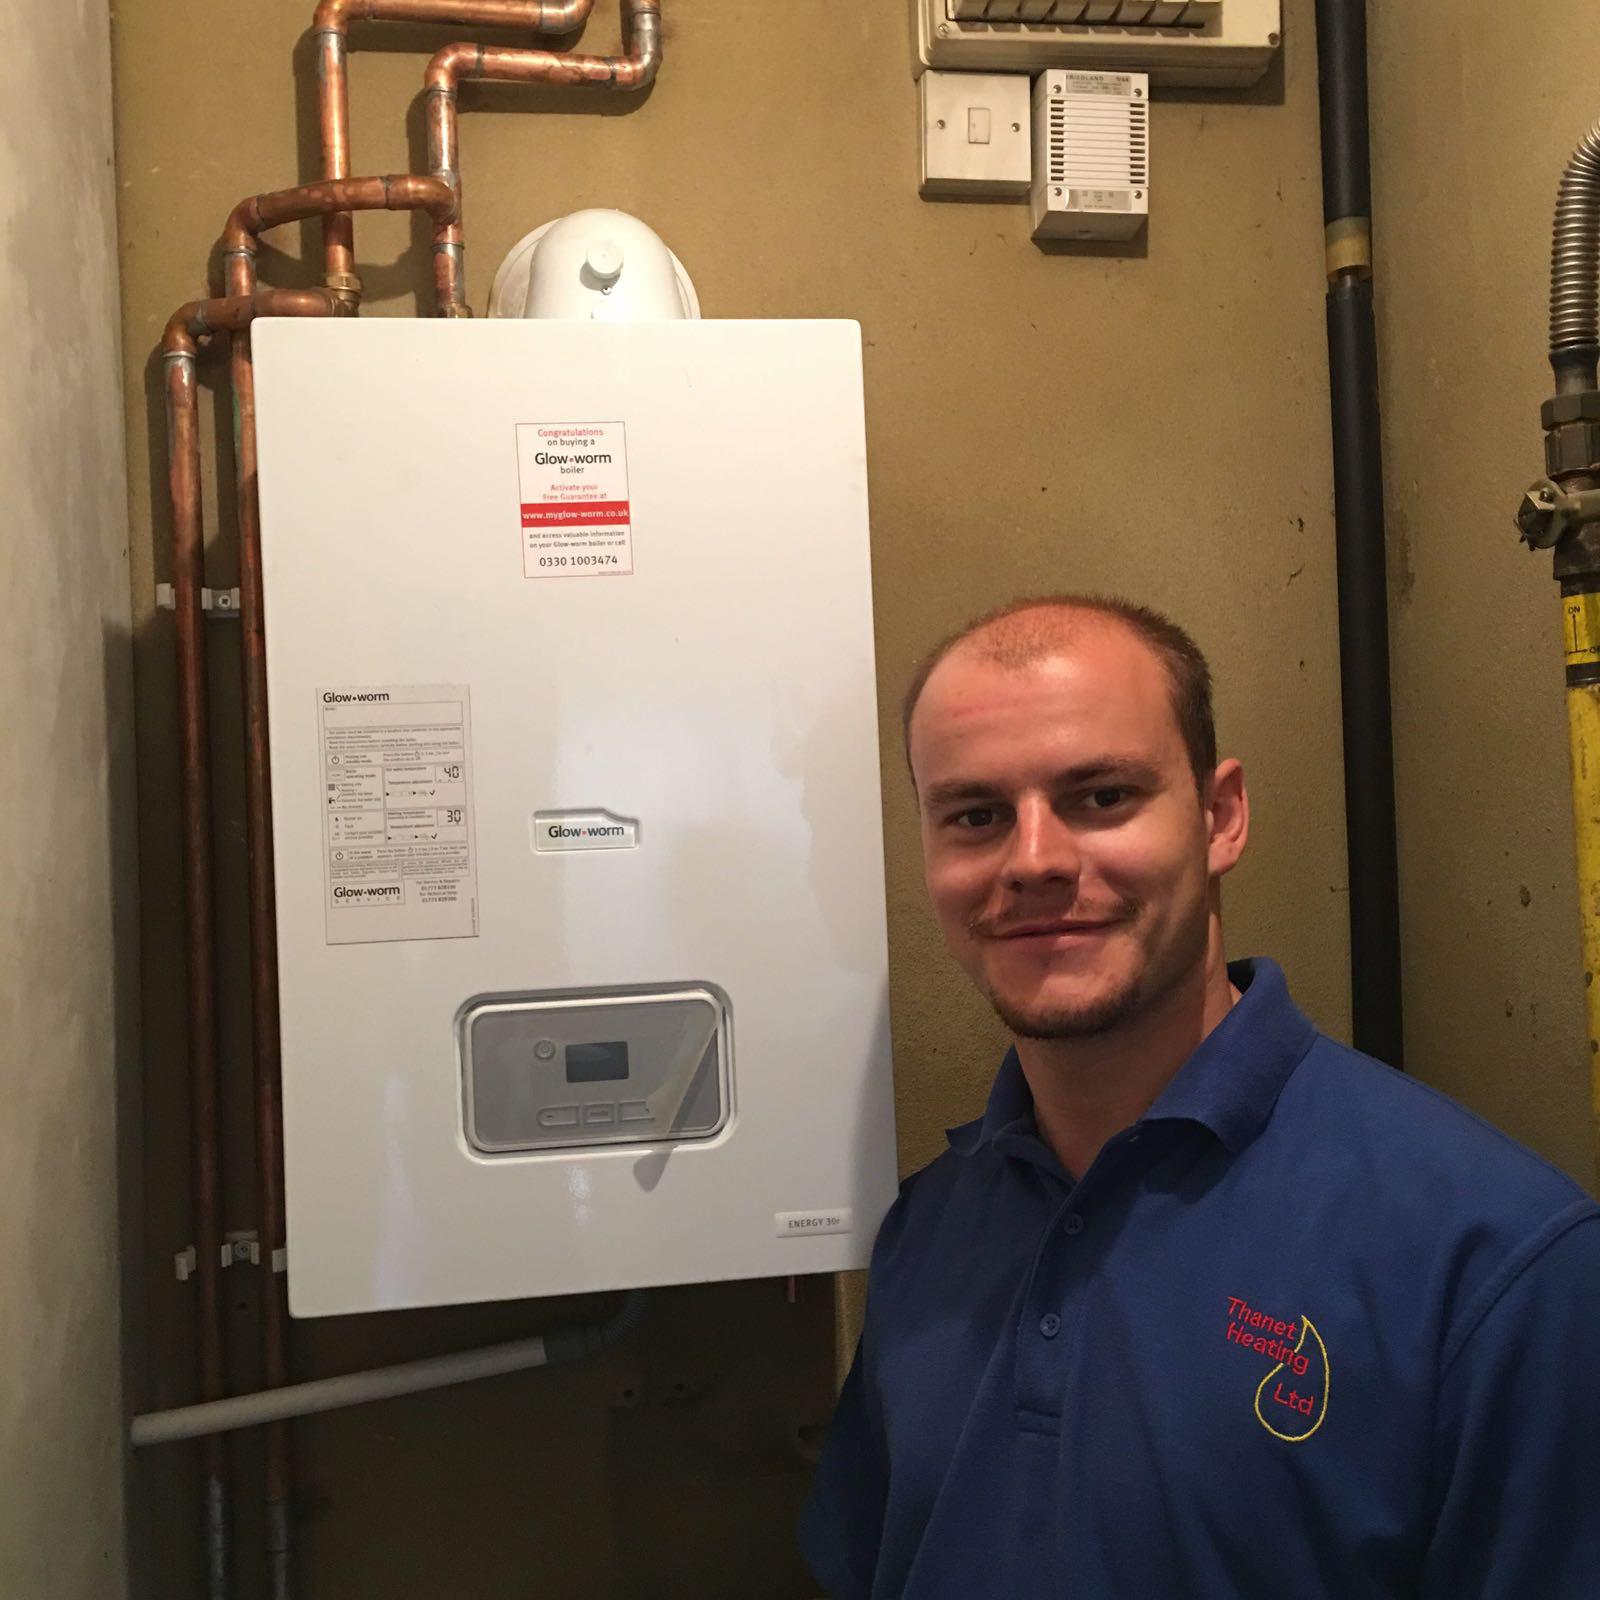 Glow-worm Boiler Install in Margate